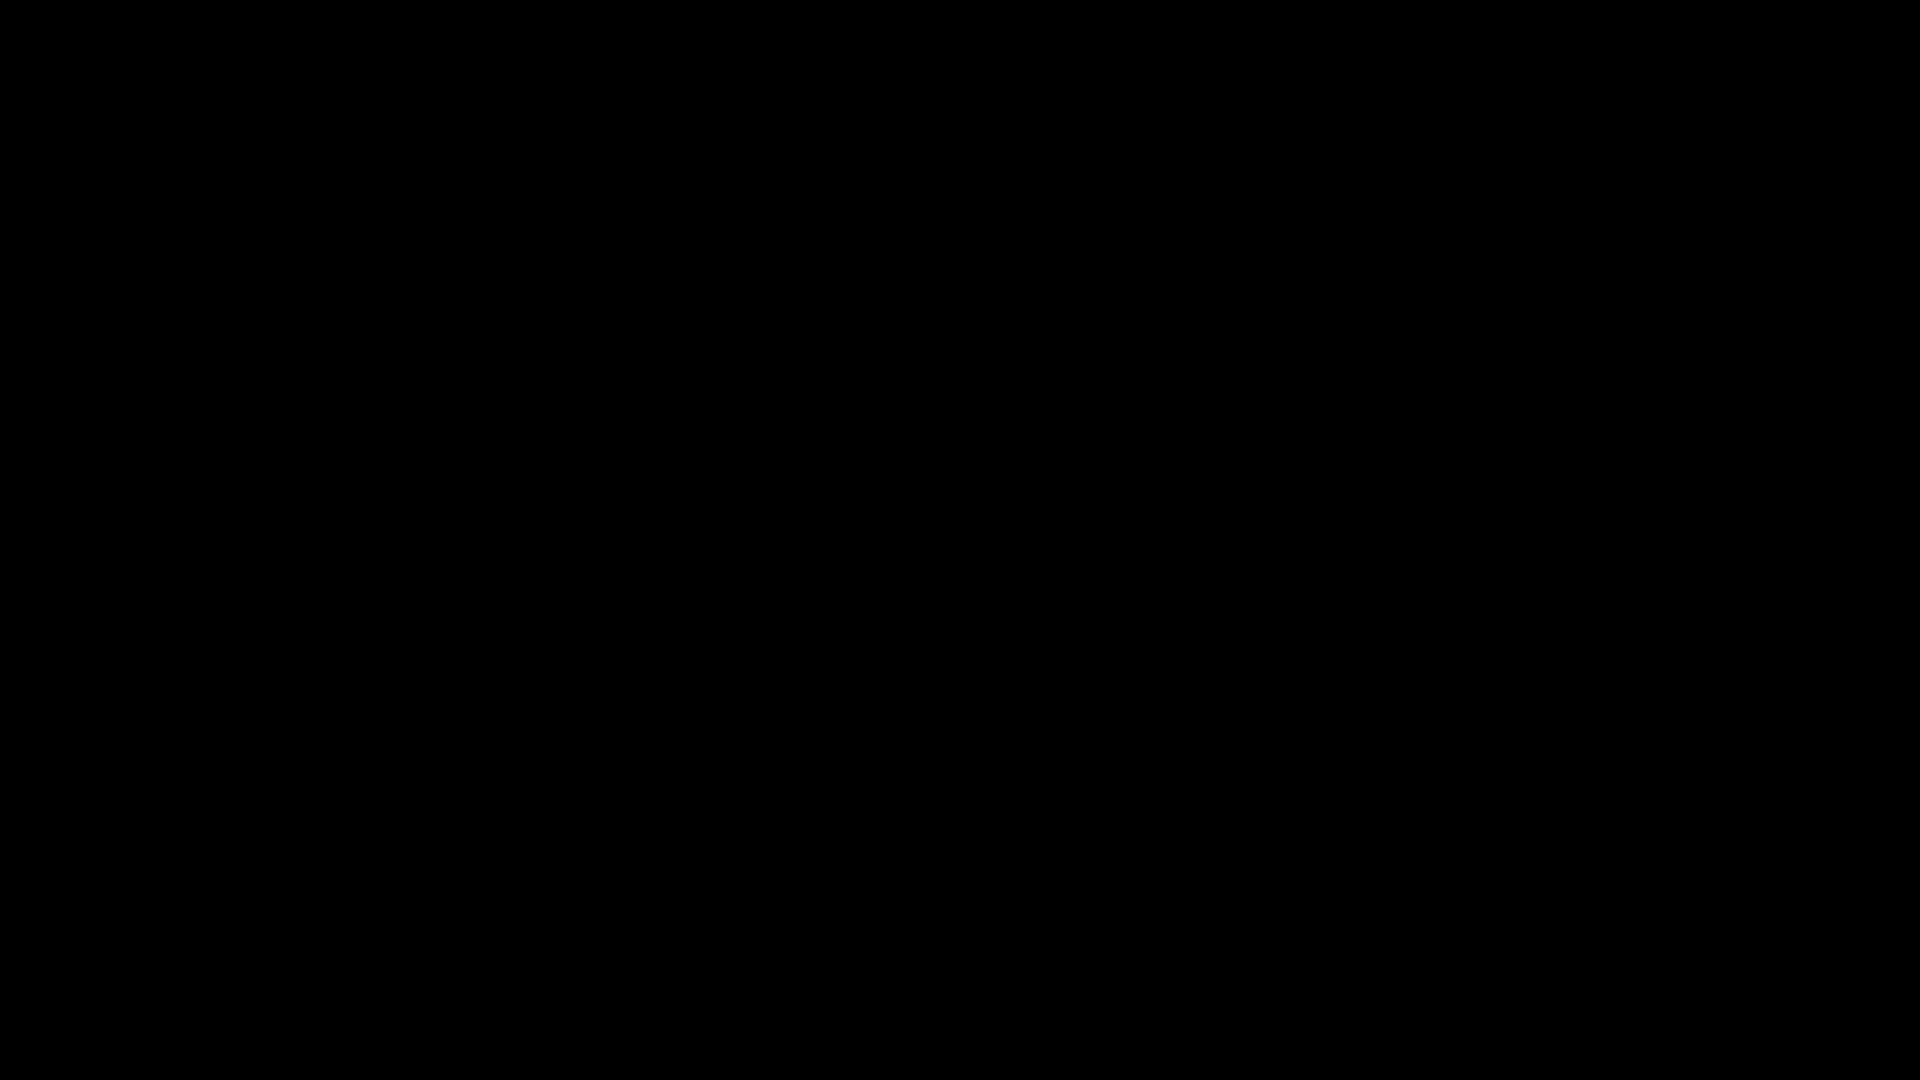 GBG logo in black. Links to GBG website.